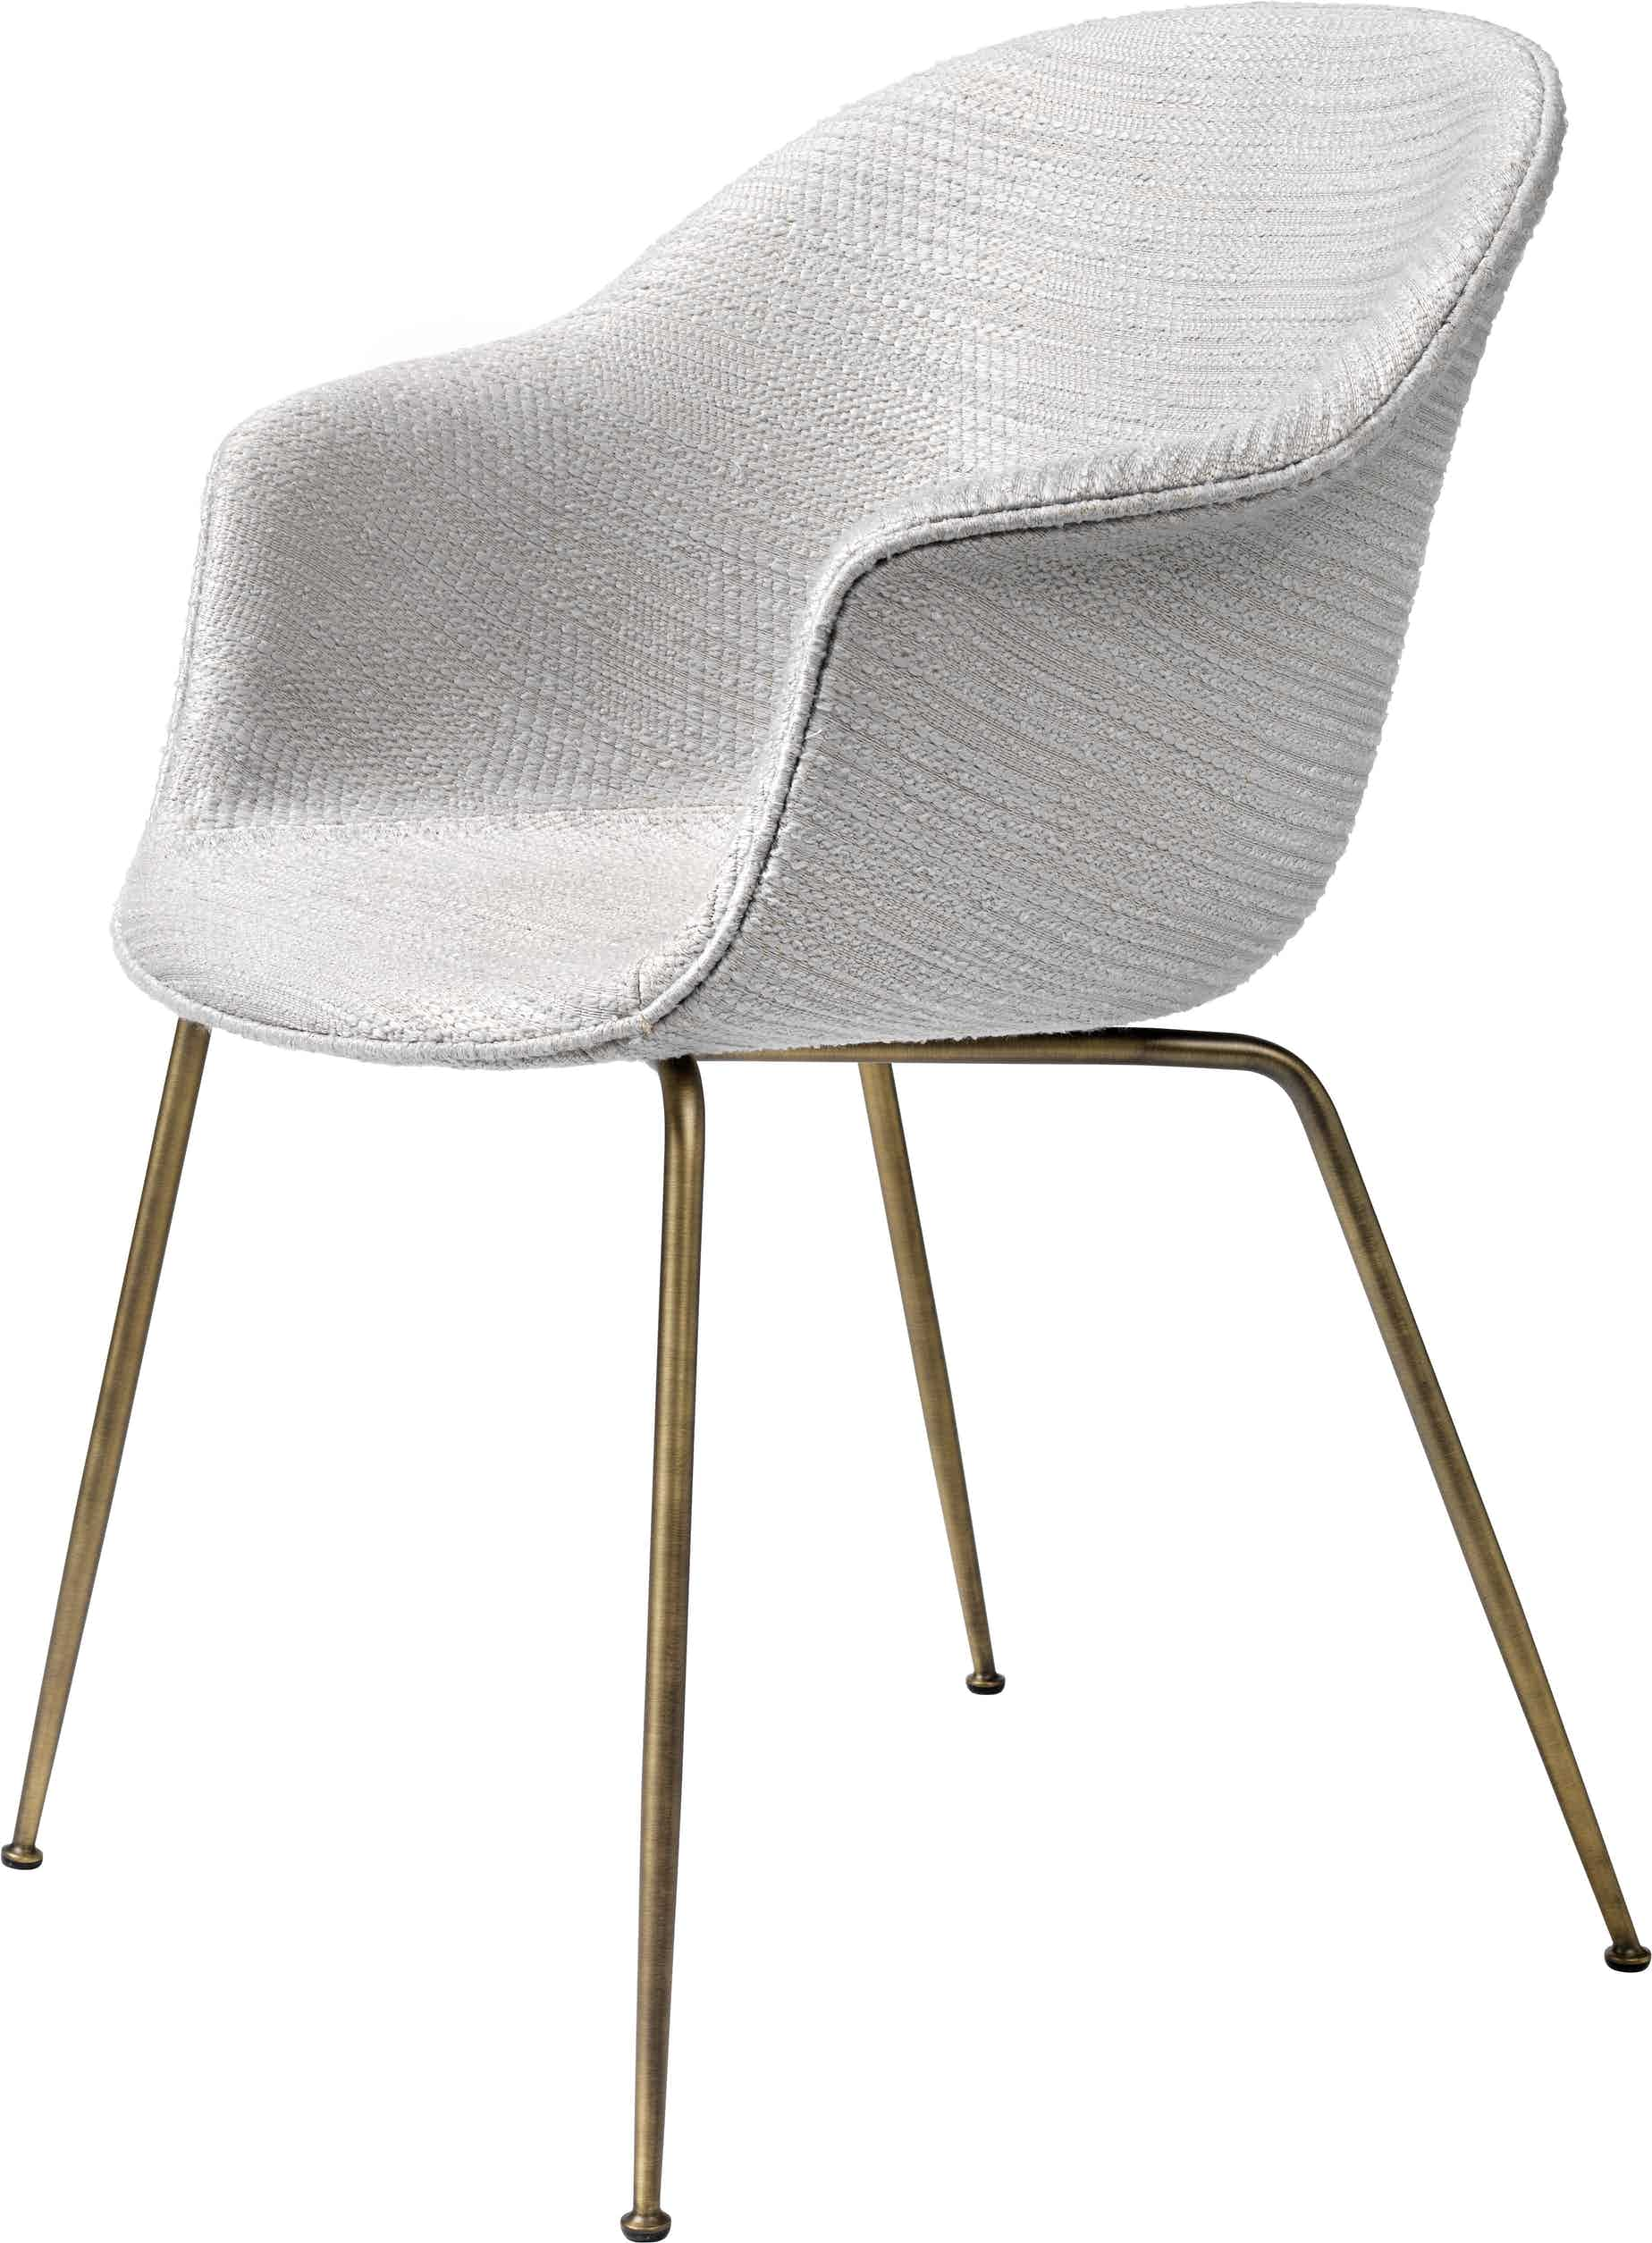 Gubi-bat-dining-chair-grey-haute-living